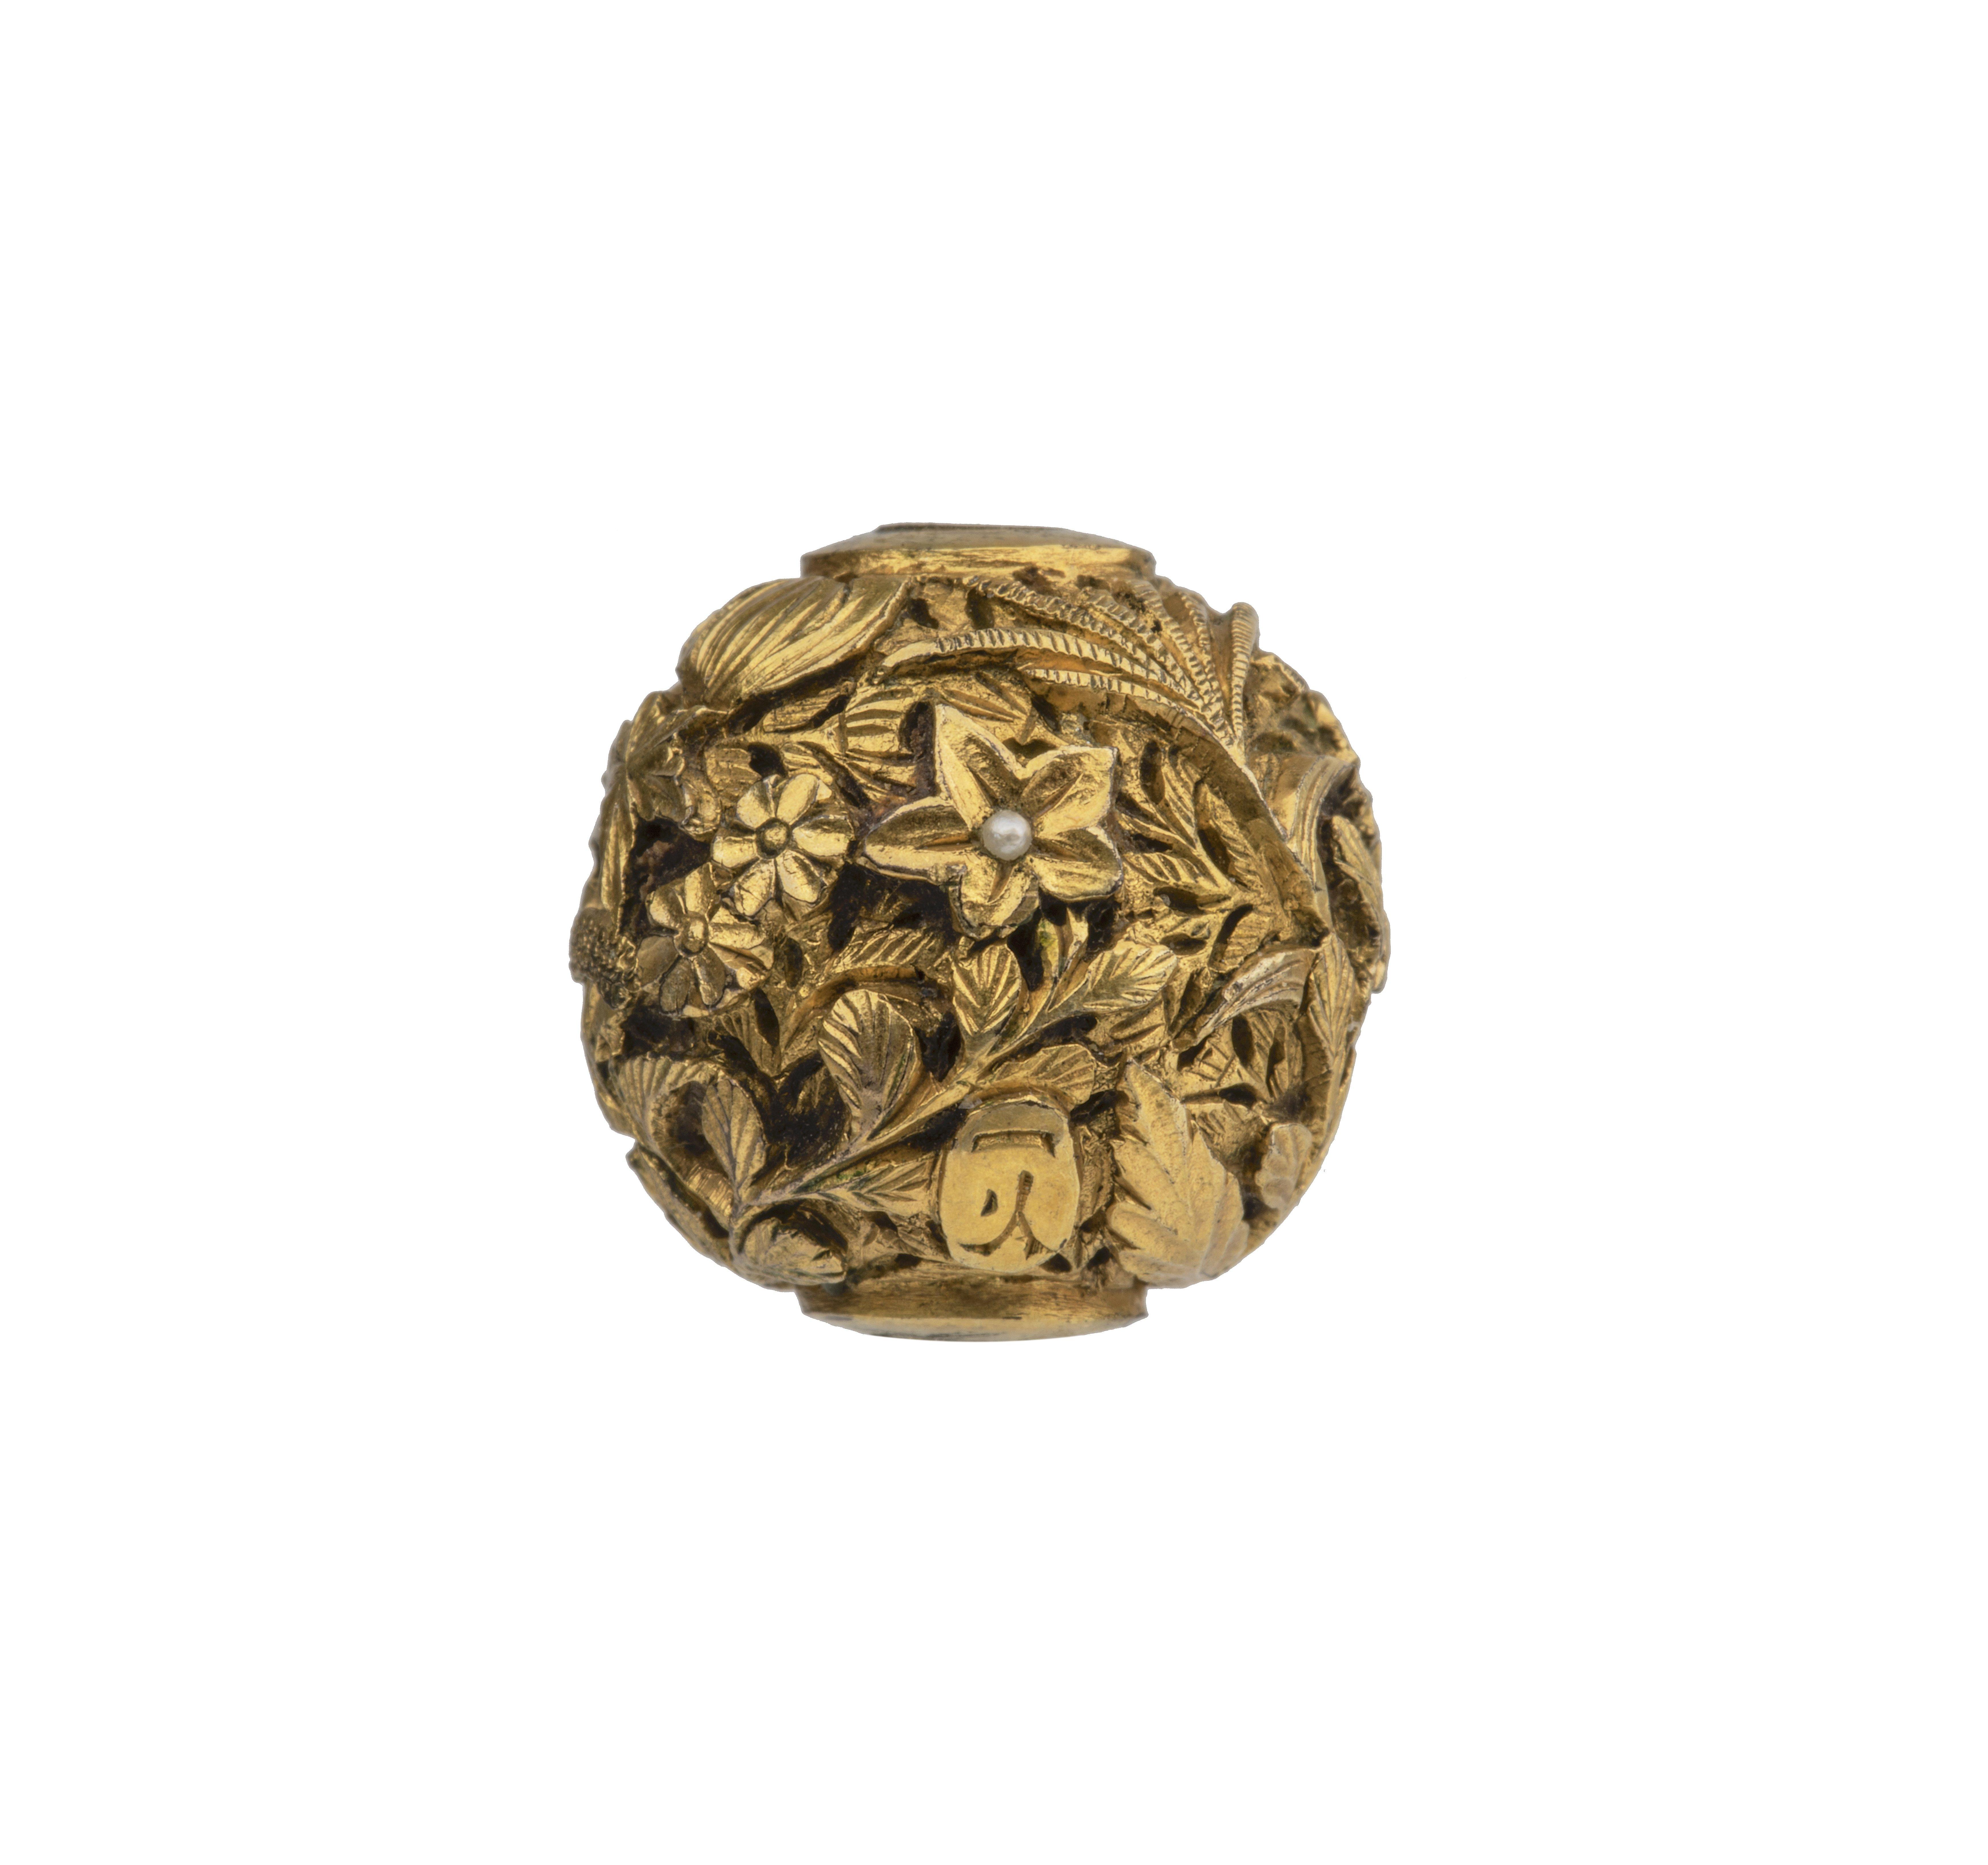 An Antique Japanese Meiji Era Signed Gilt Bronze Pearl Inlaid Ojime Bead